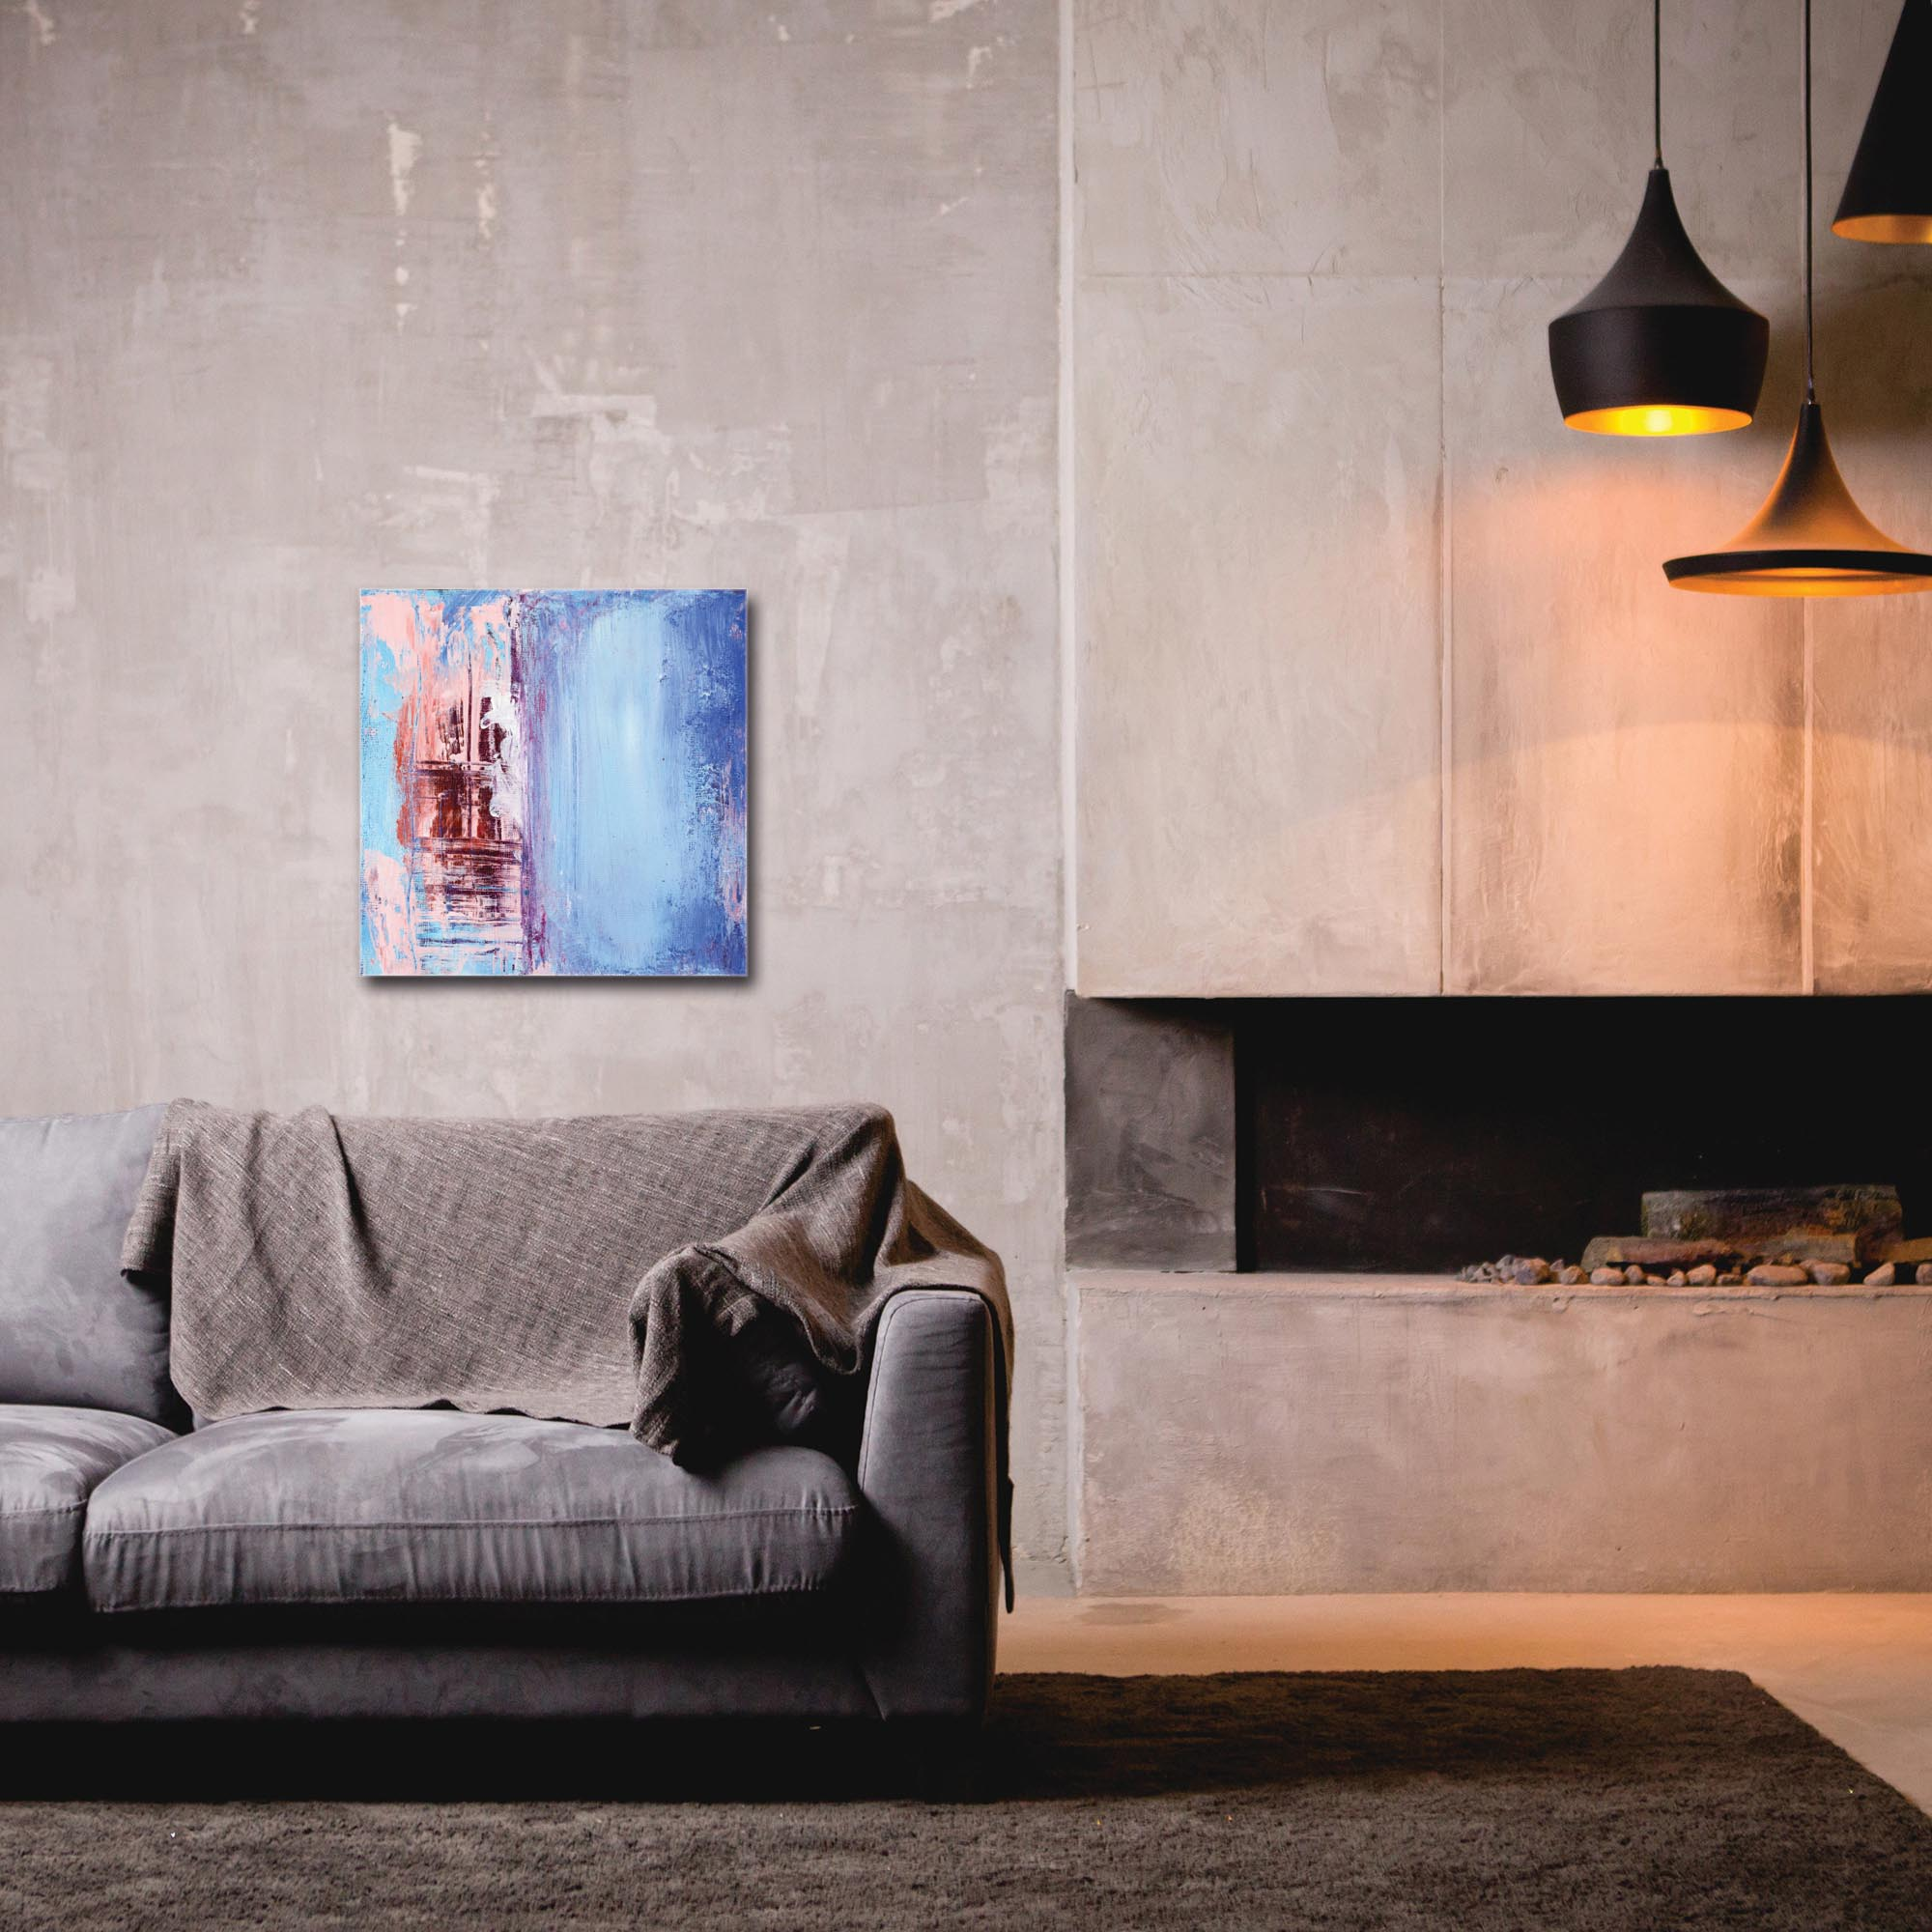 Abstract Wall Art 'Urban Life 2' - Urban Decor on Metal or Plexiglass - Image 3